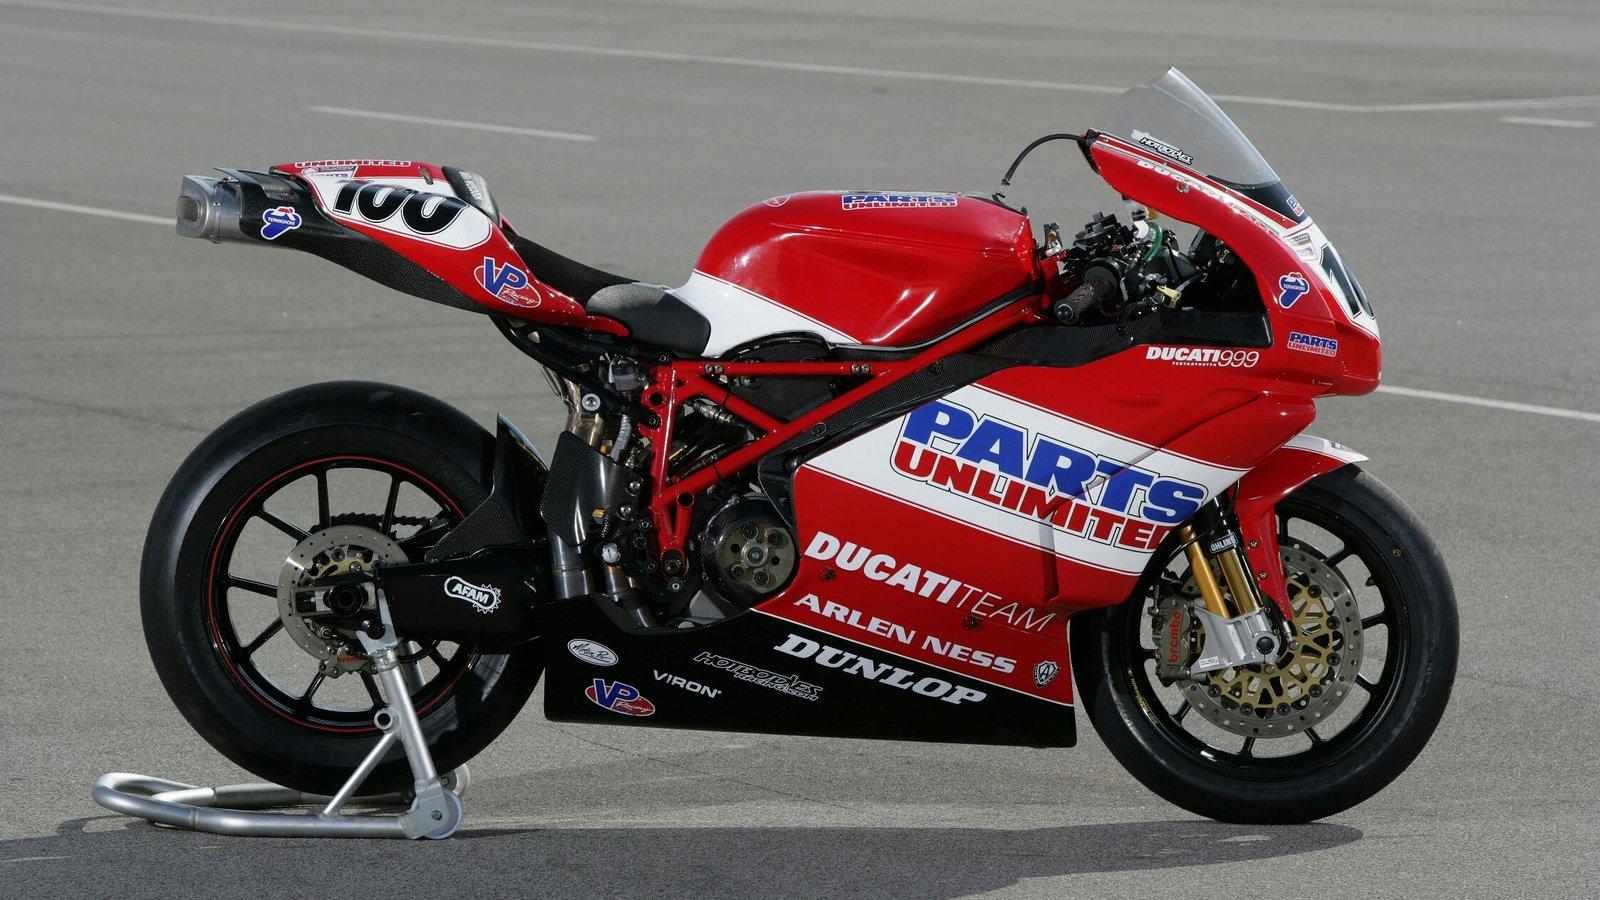 2006-ducati-999-rs-ama-sbk-hodgson-8~2.jpg